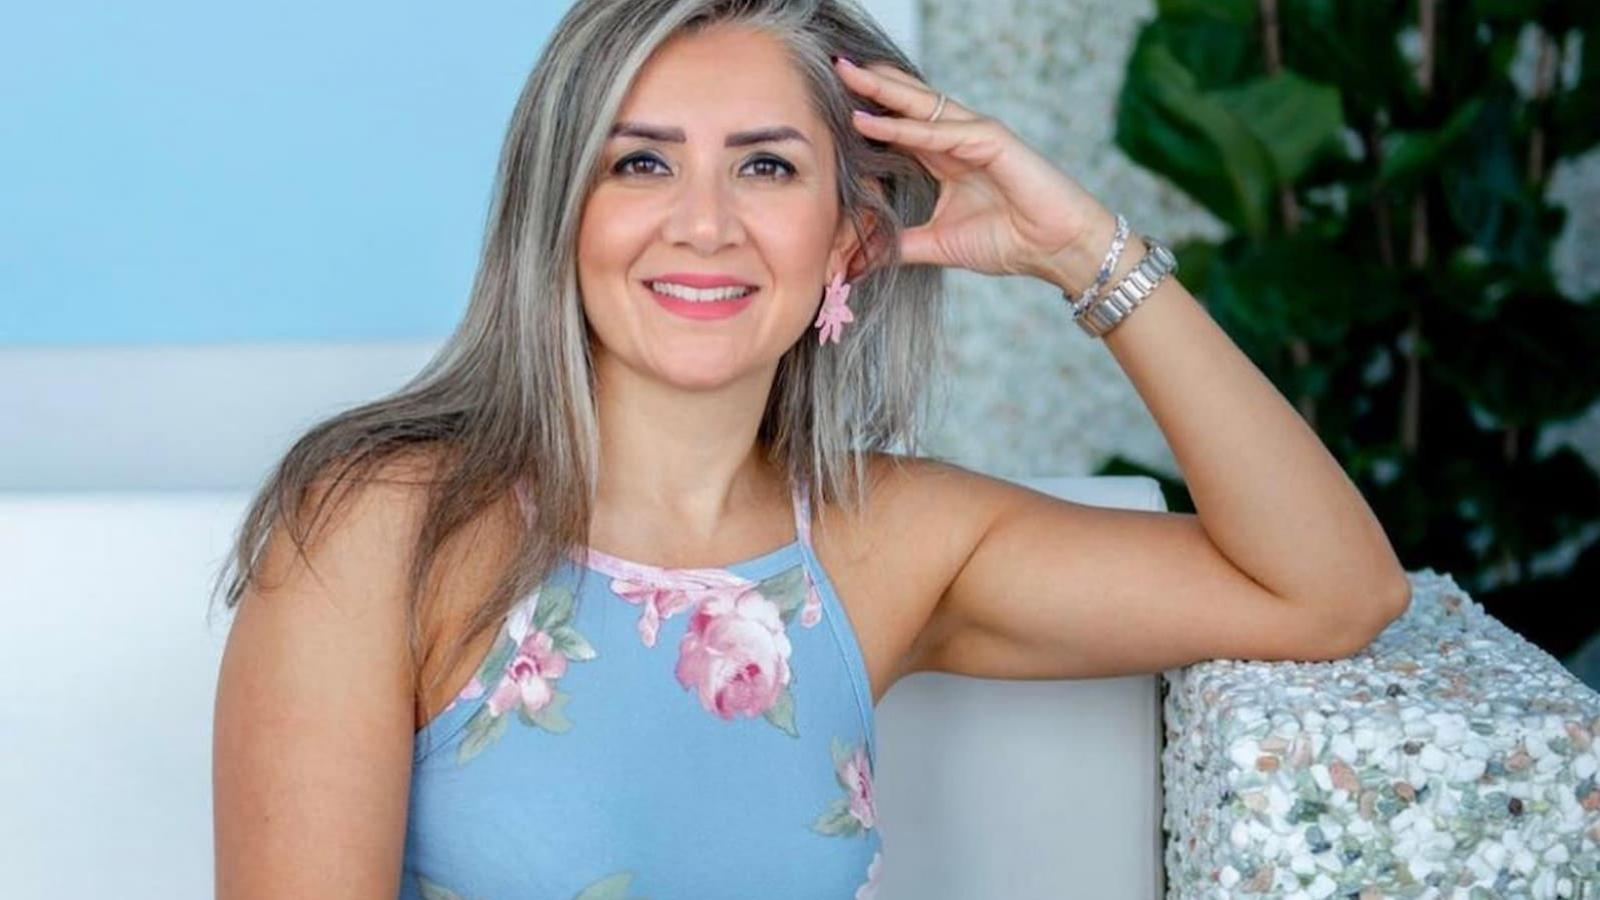 WATCH: QL Jobs: Career Talks with Life and Executive Coach, Faten El Ayache